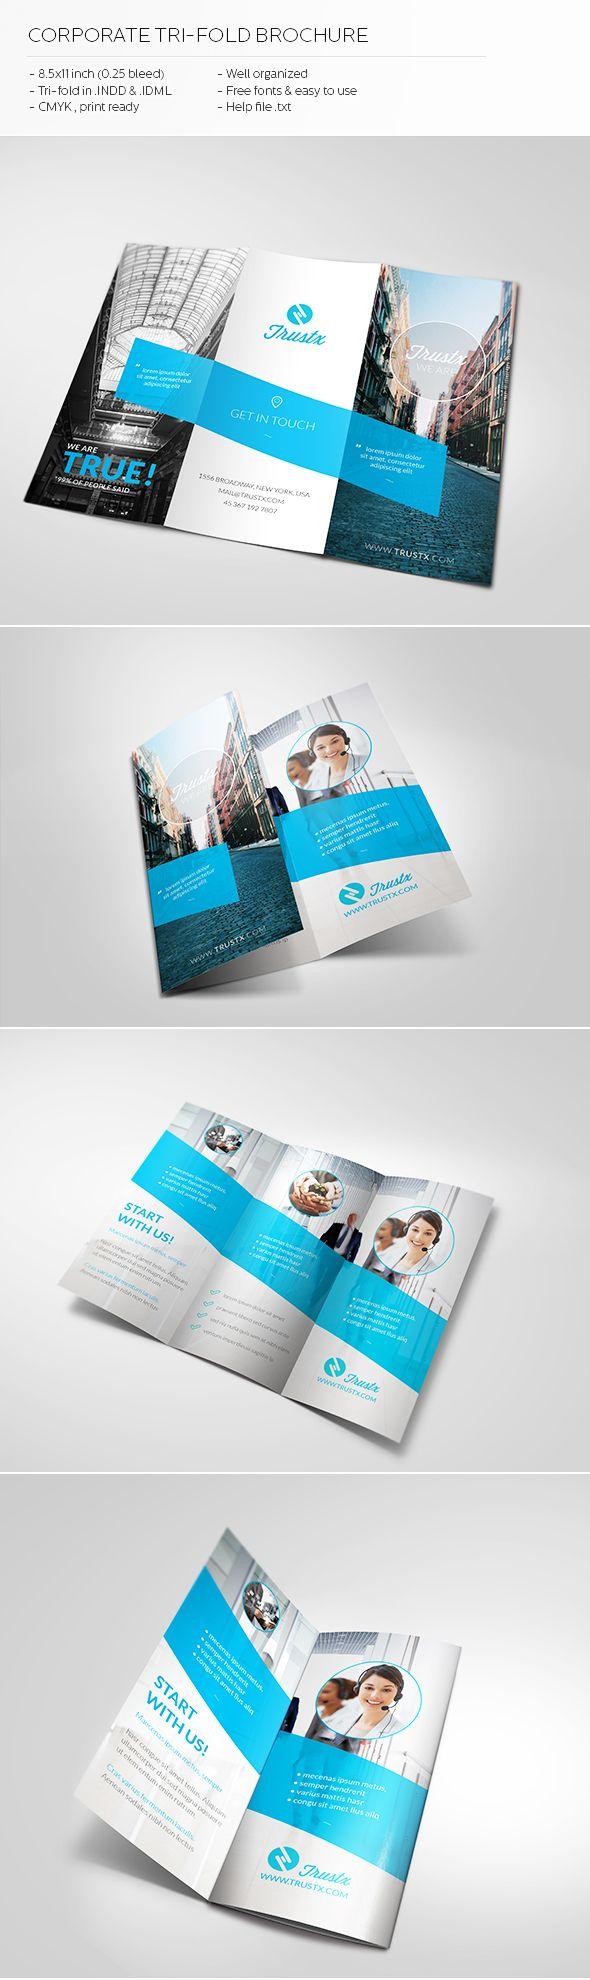 Trustx - Corporate Tri-fold Brochure by Realstar , via Behance